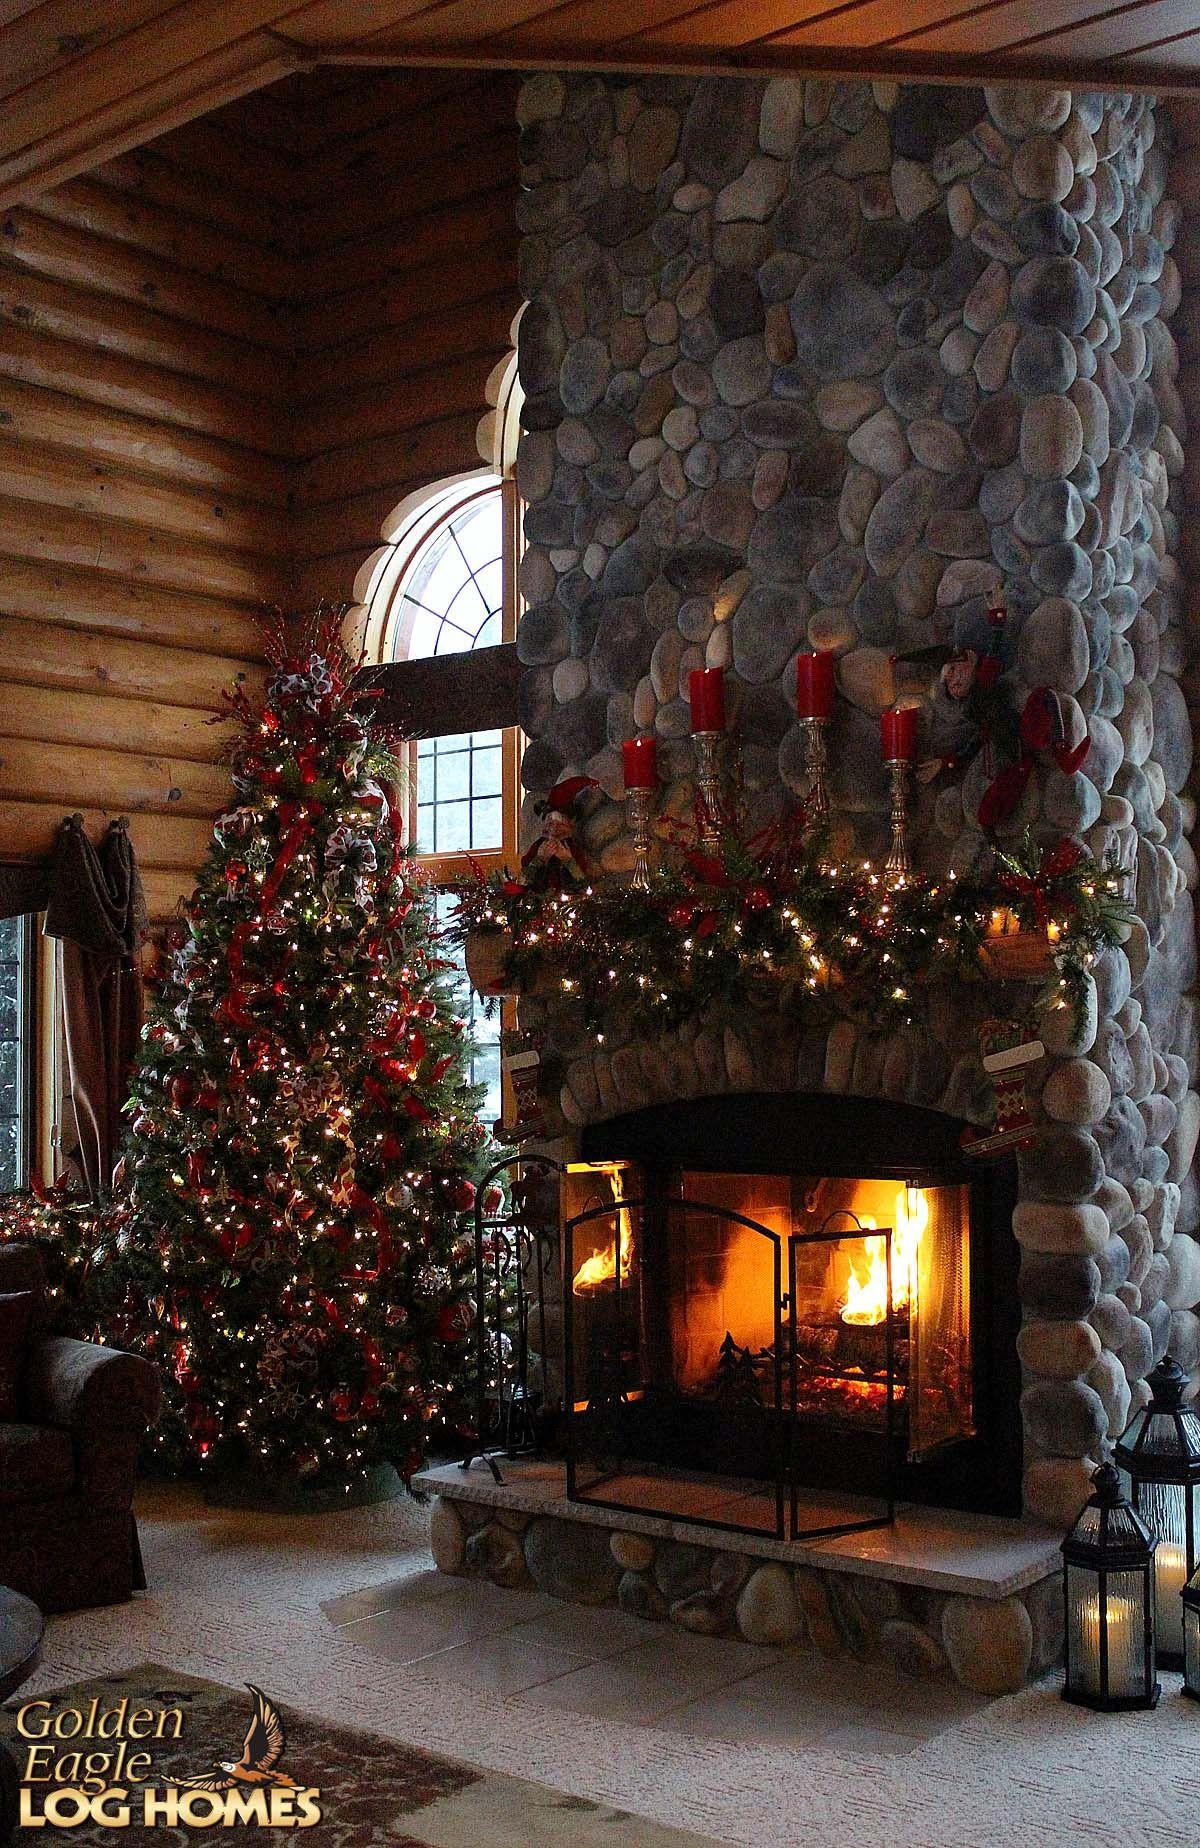 Christmas Snow Holidays Loghome Logcabin Loghomes Logcabins Loghomeliving D Christmas Decorations Rustic Christmas Fireplace Christmas Fireplace Decor